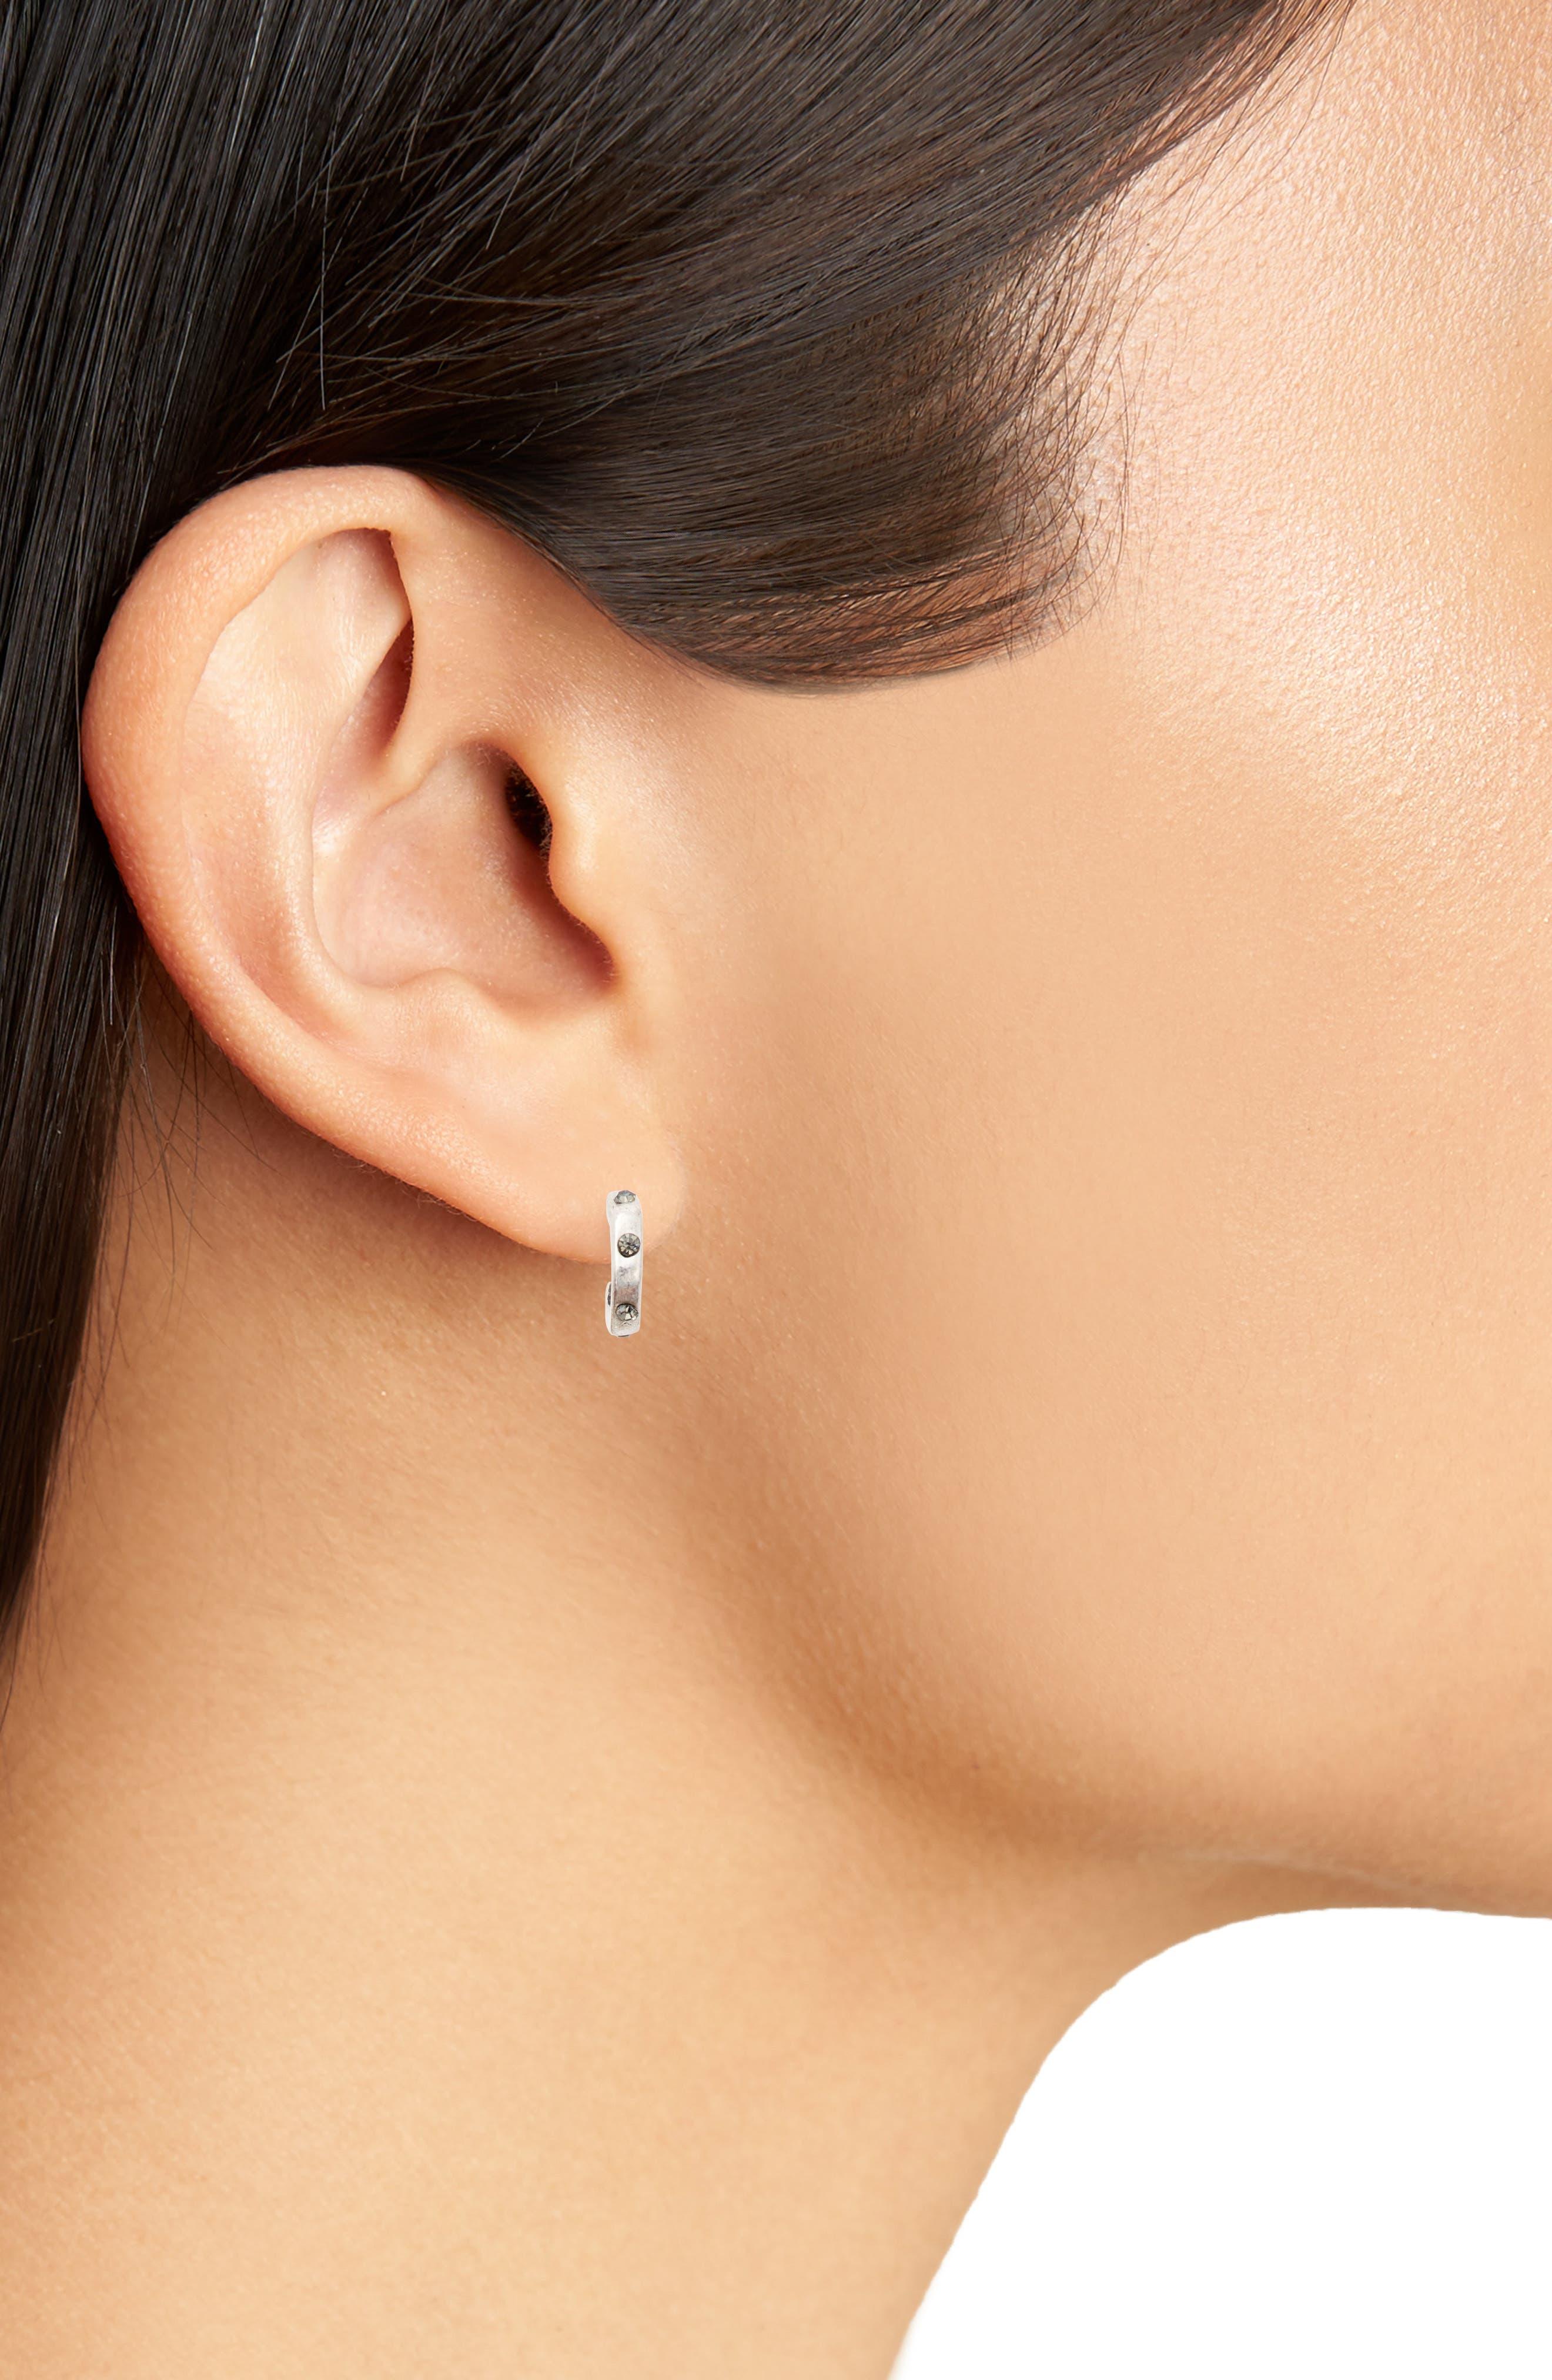 Pack of 4 Stud Earrings,                             Alternate thumbnail 3, color,